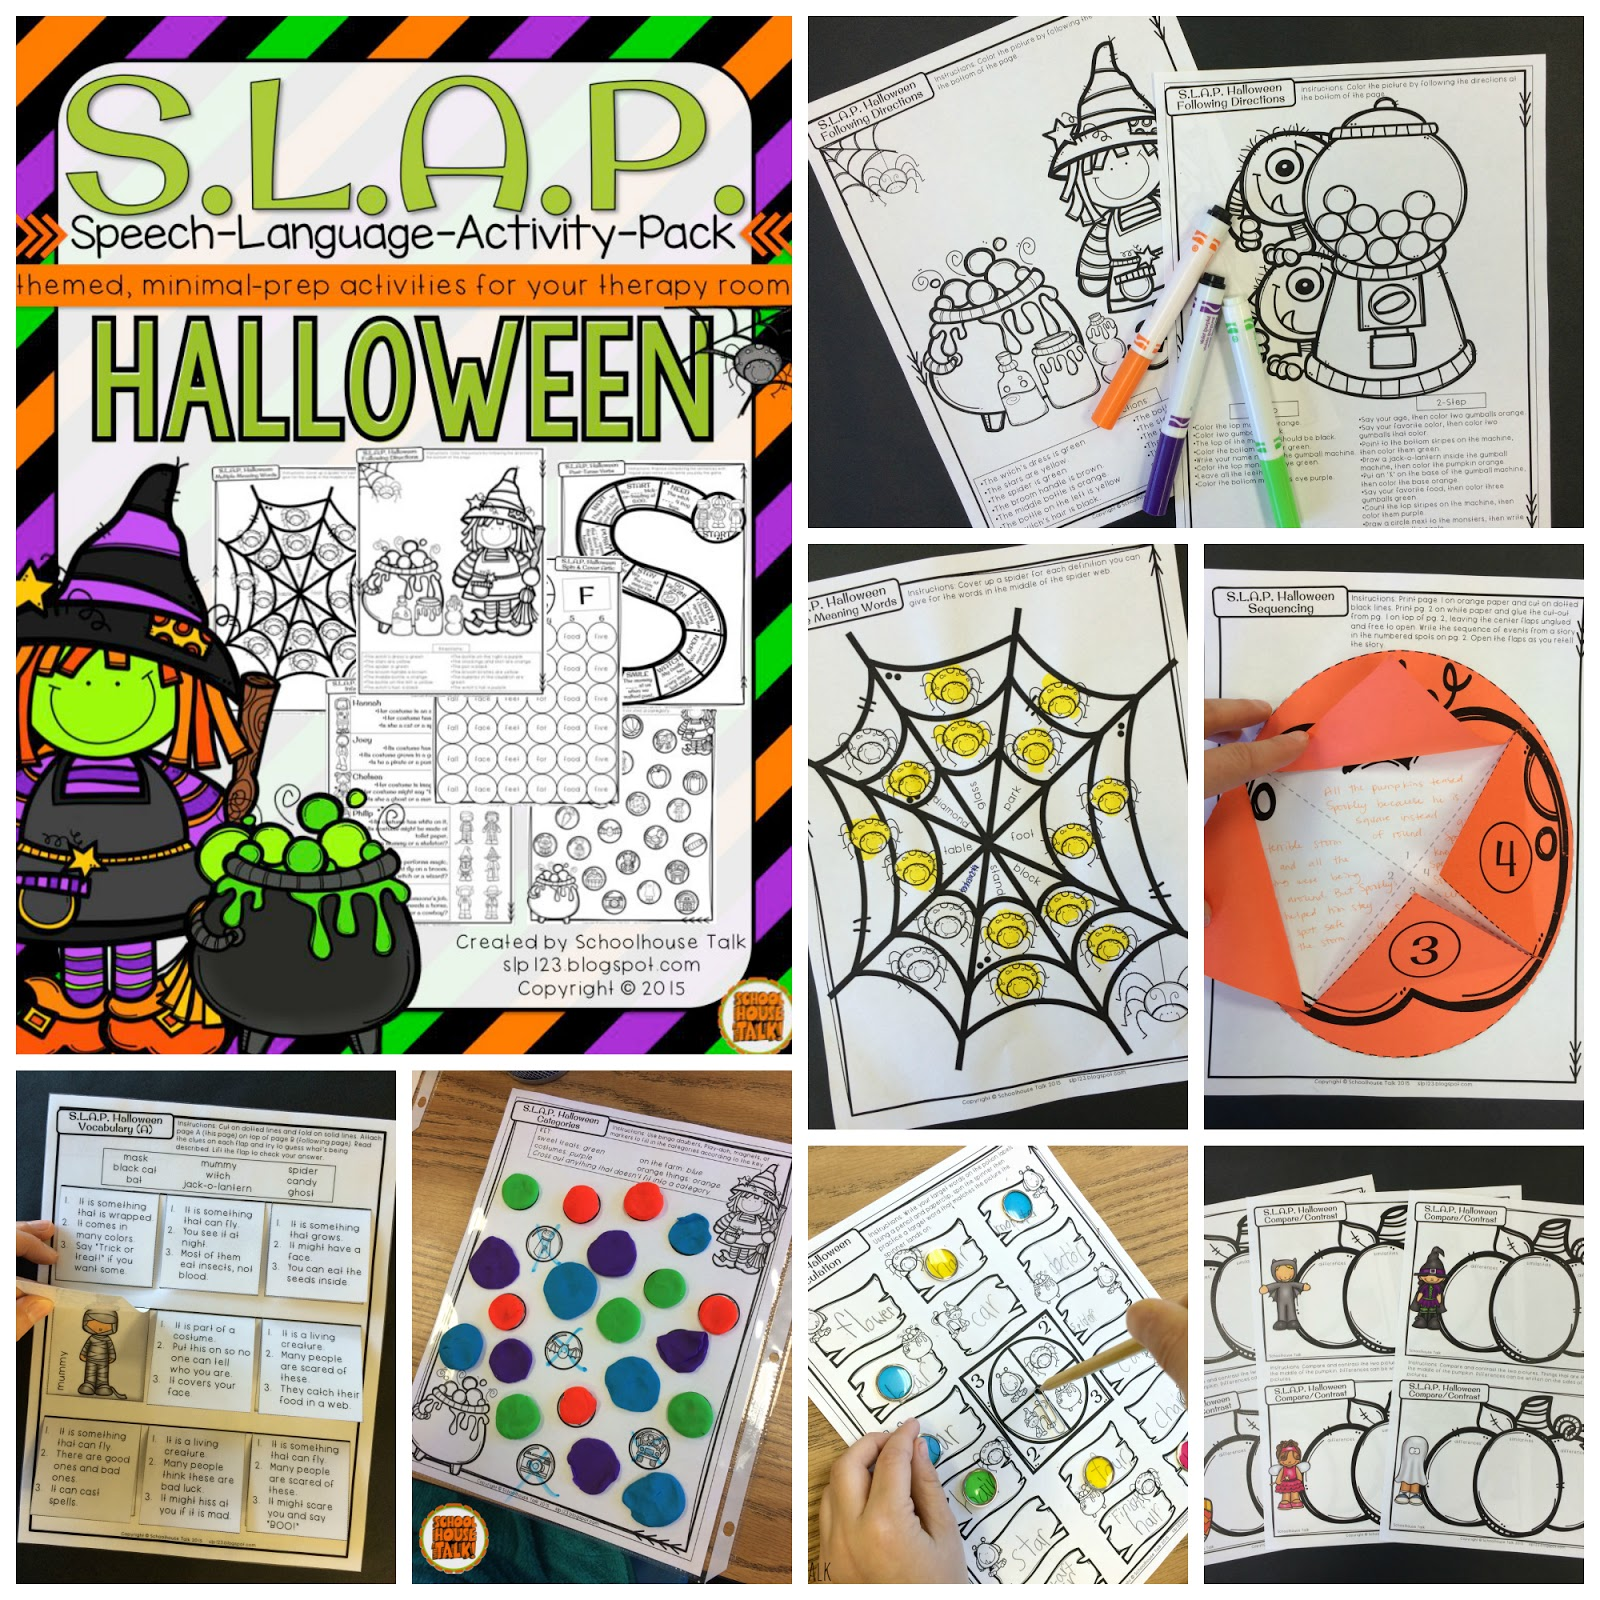 Schoolhouse Talk Halloween Language Tricks And Treats